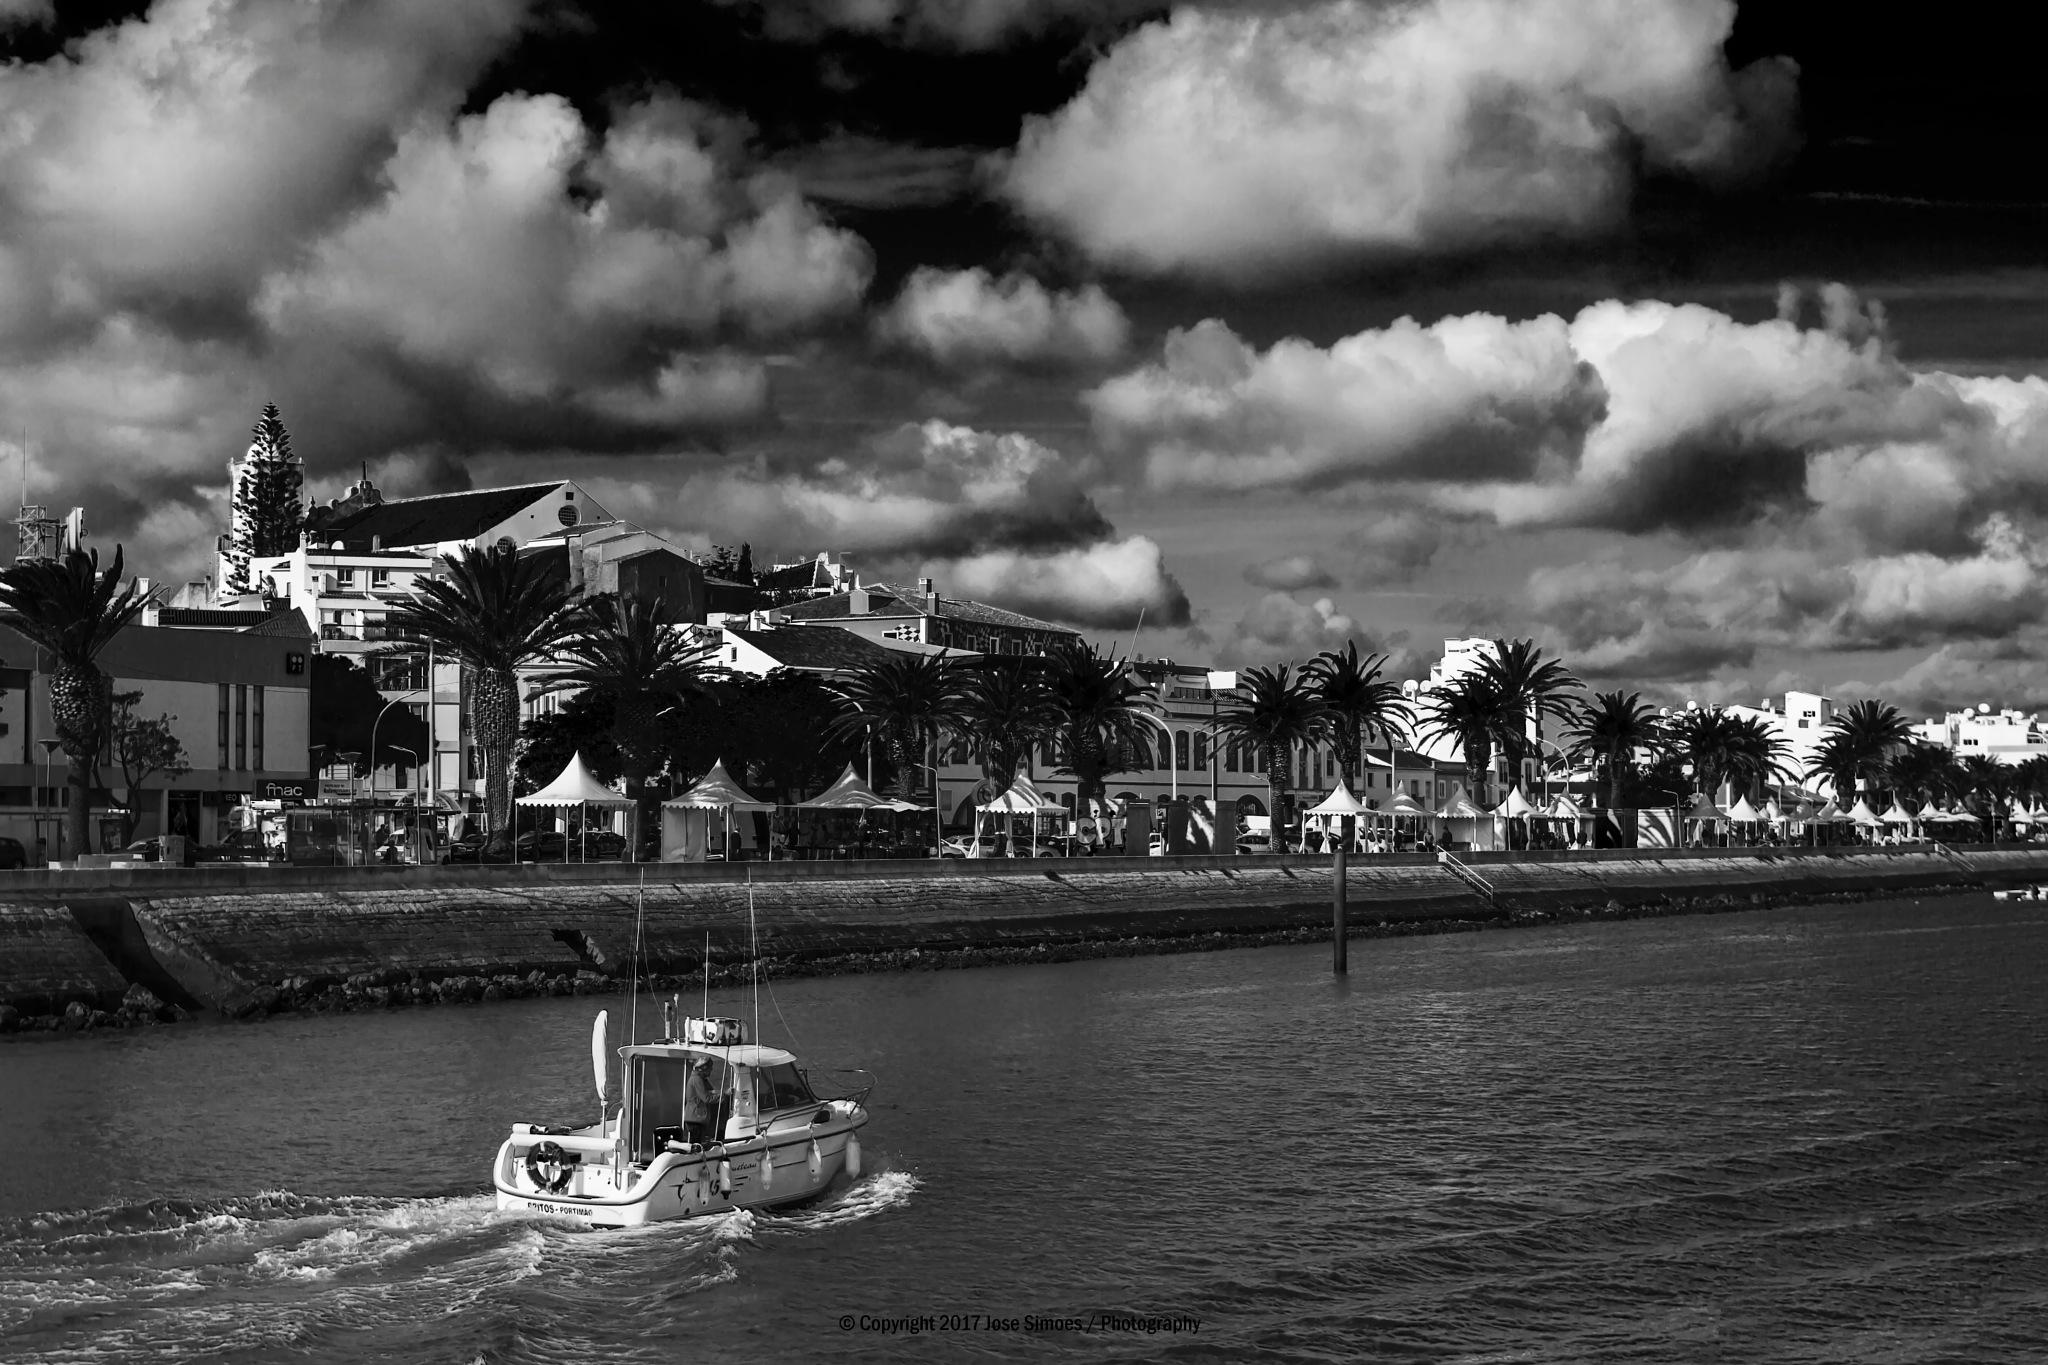 City of Lagos by Jose Simoes